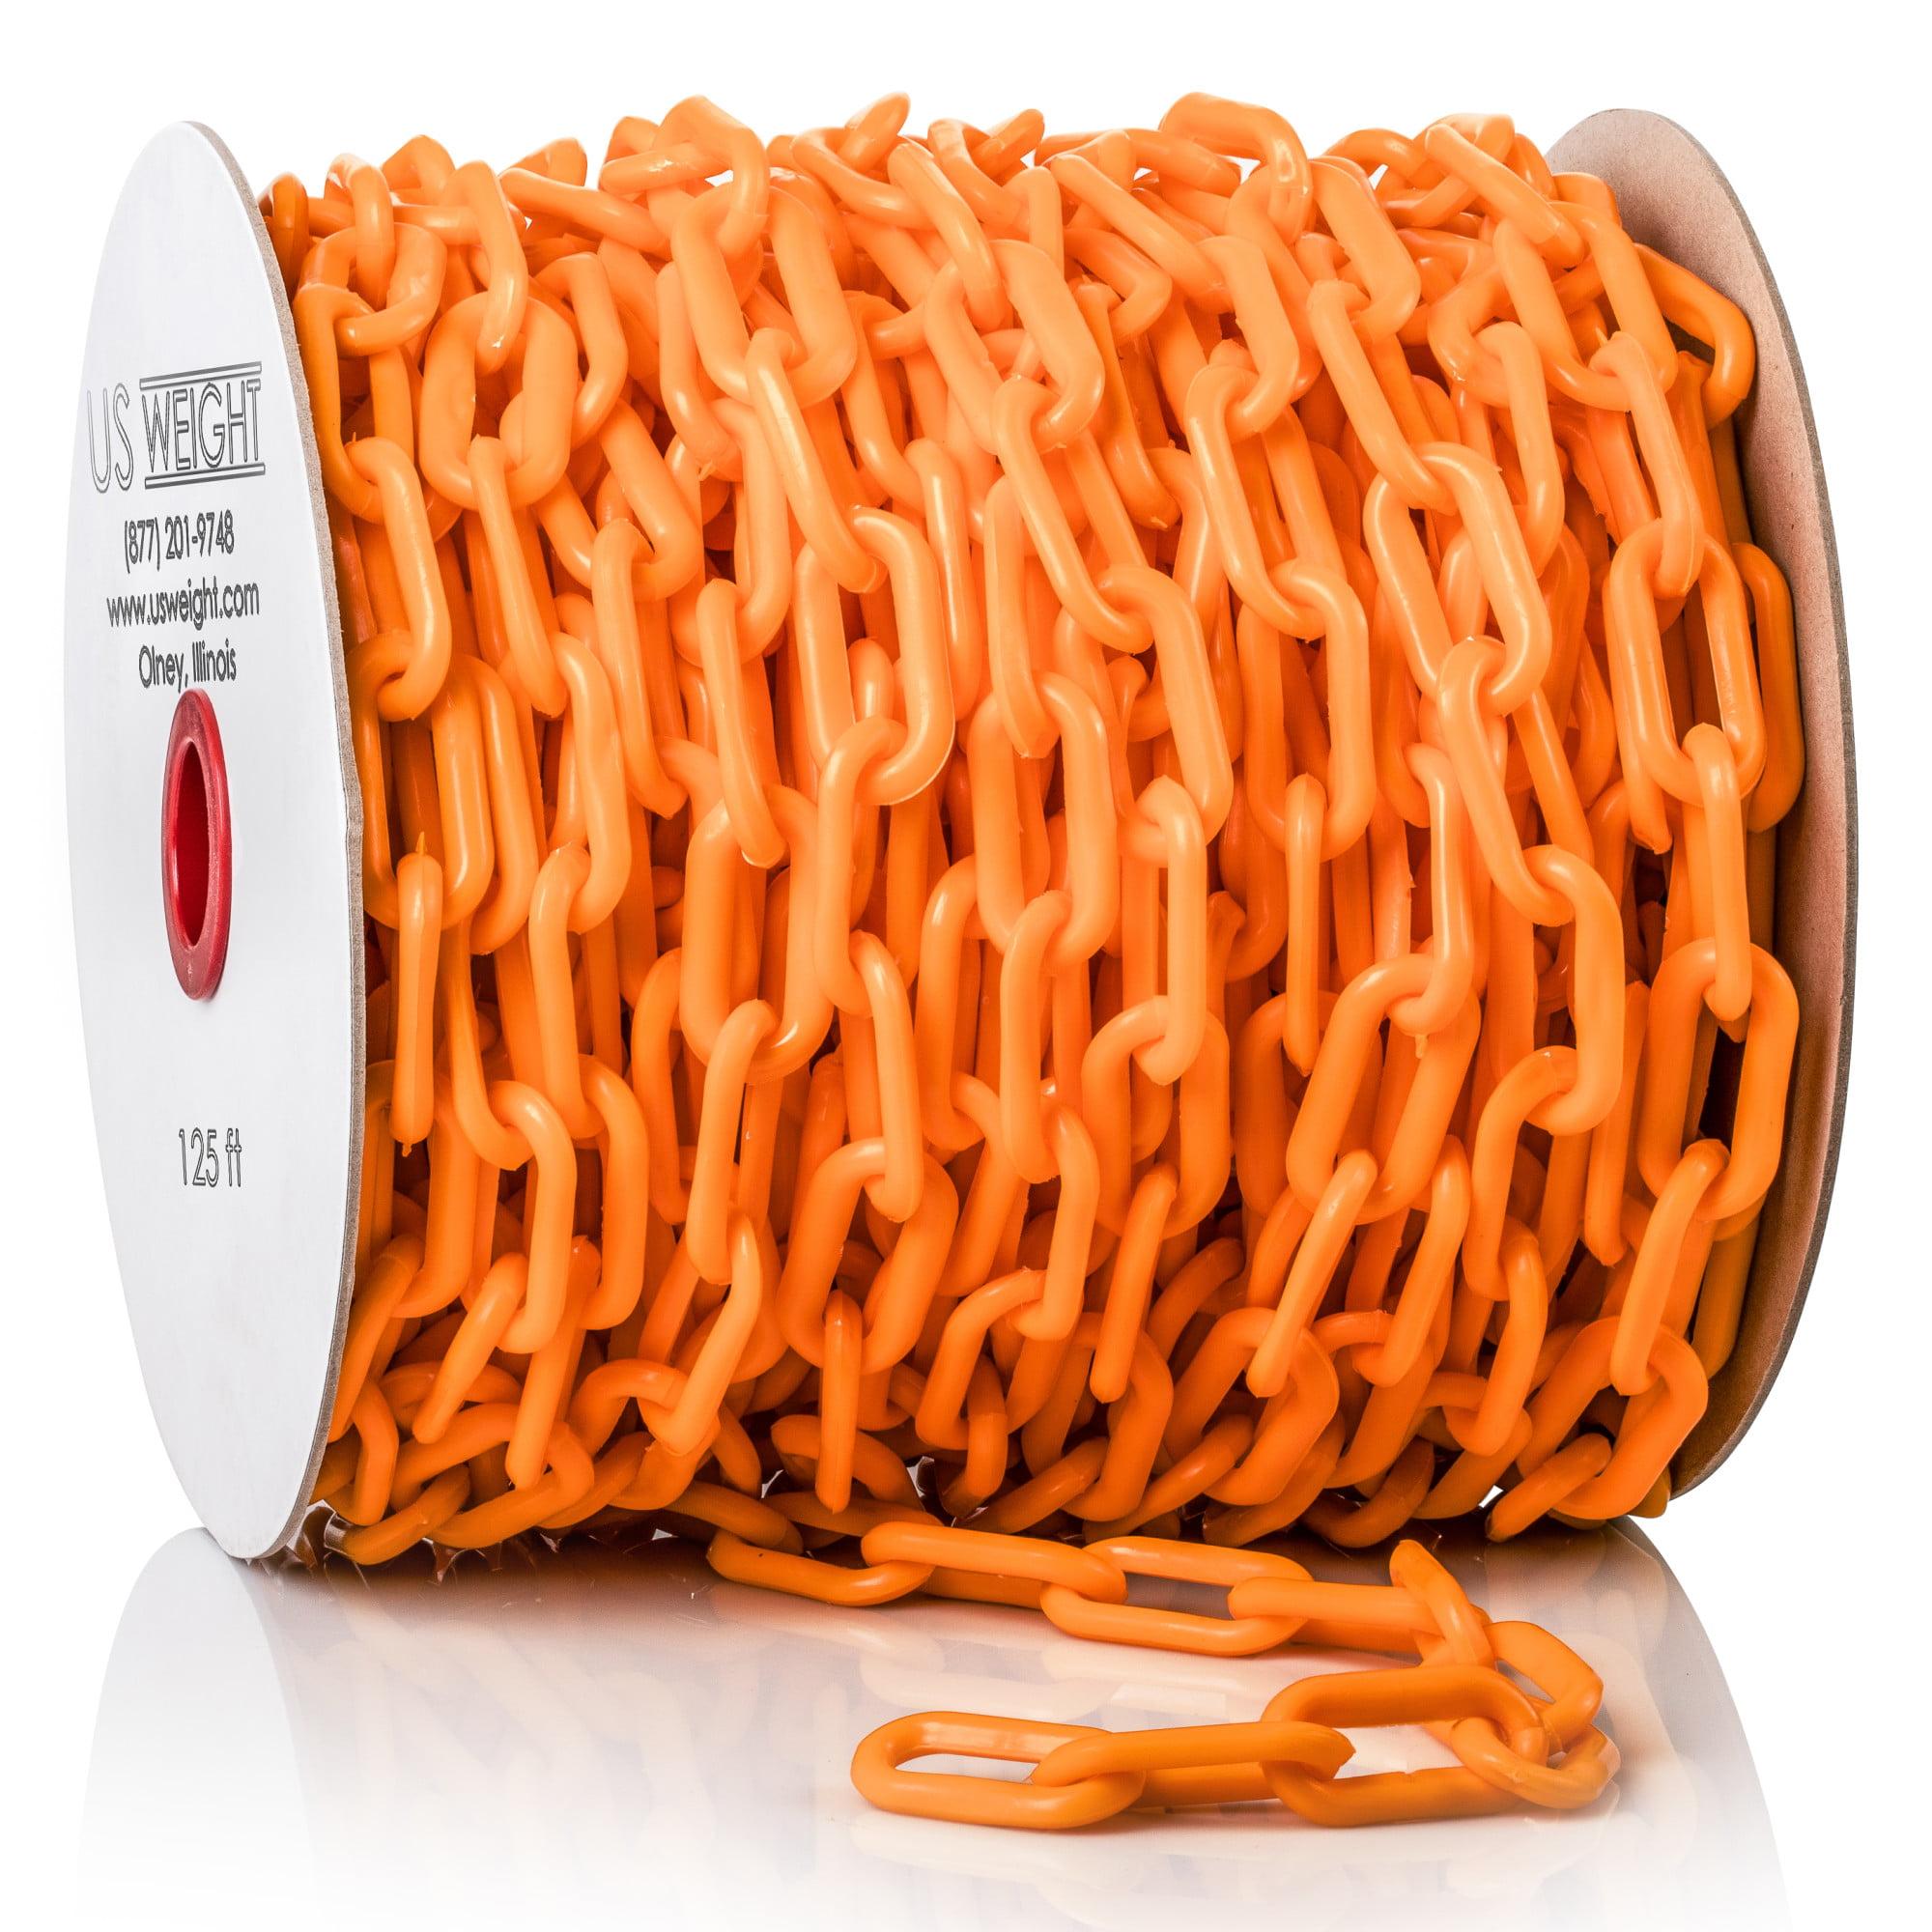 US Weight ChainBoss 2-Inch Plastic Chain –125 Feet